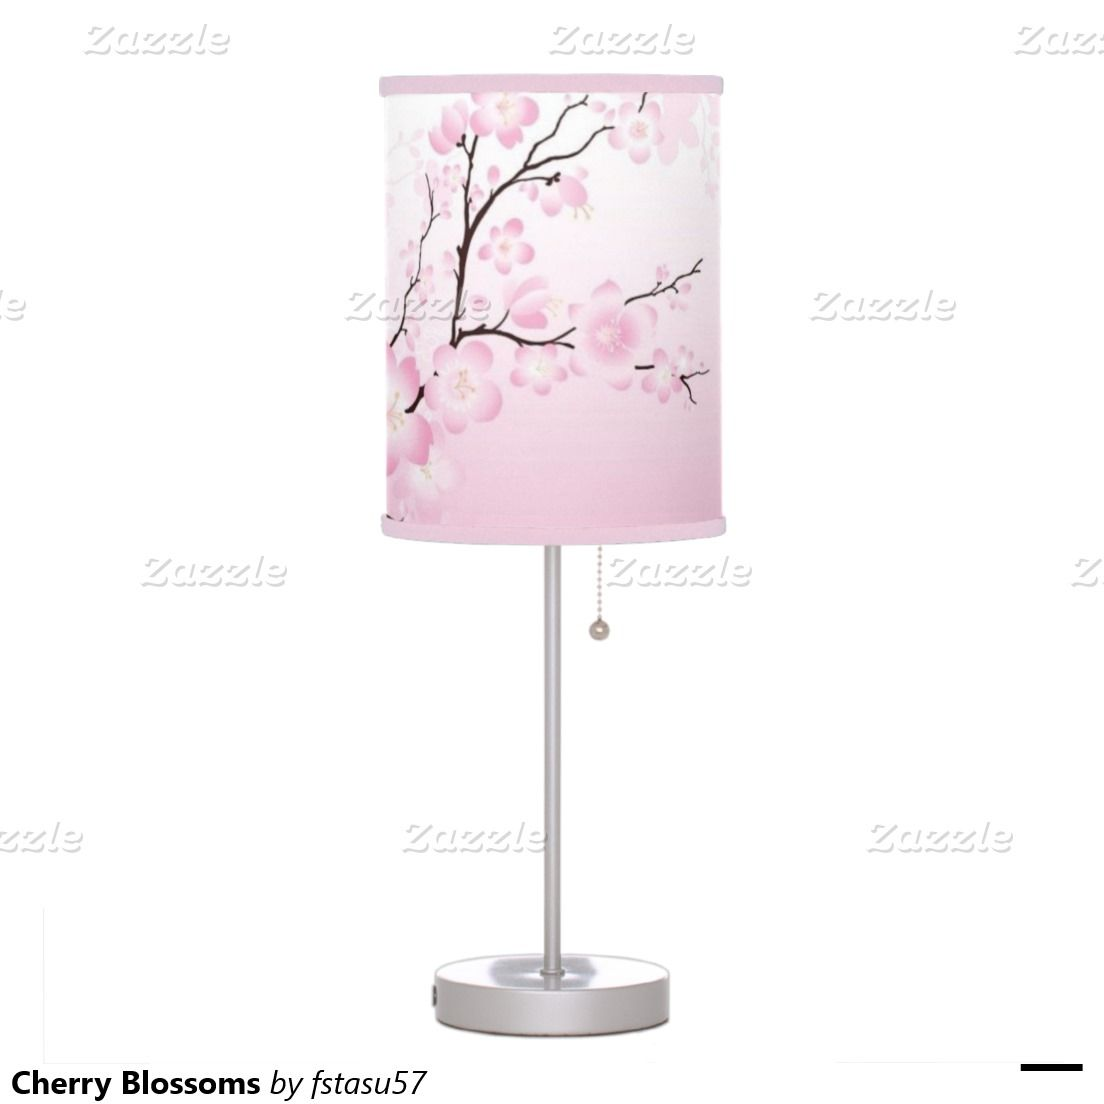 Cherry Blossoms Table Lamp Zazzle